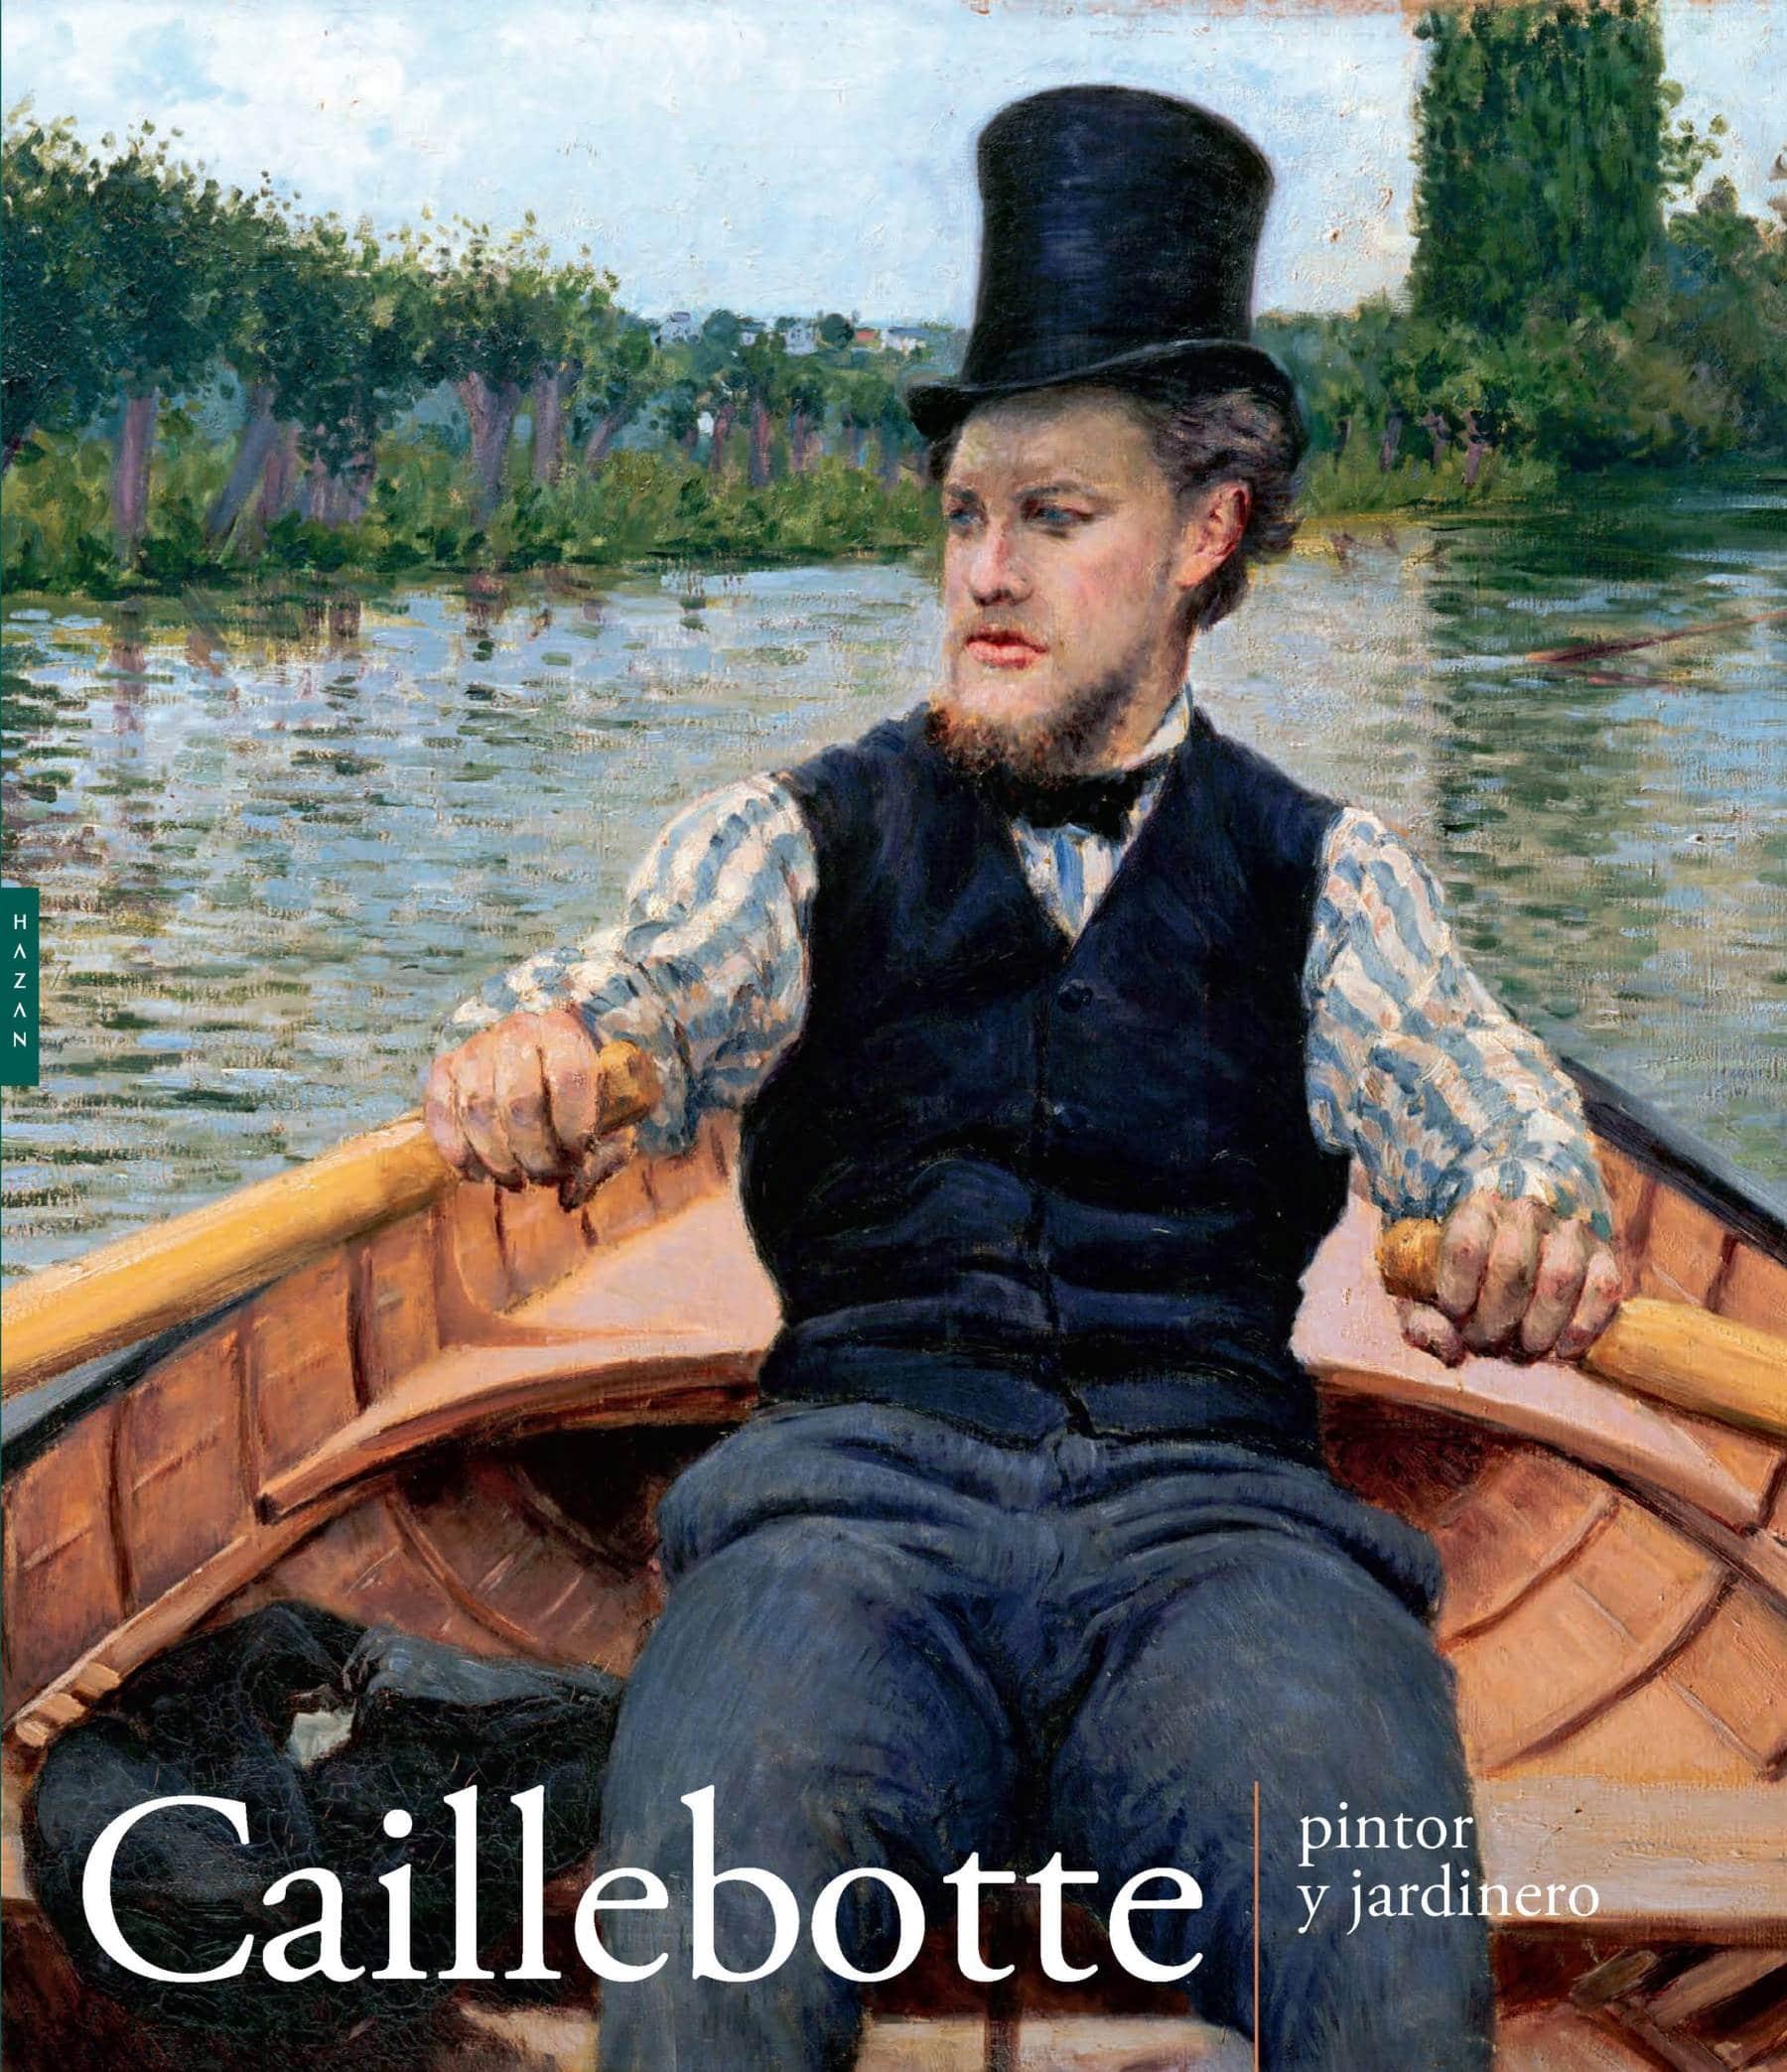 couverture catalogue exposition Caillebotte pintor y jardinero